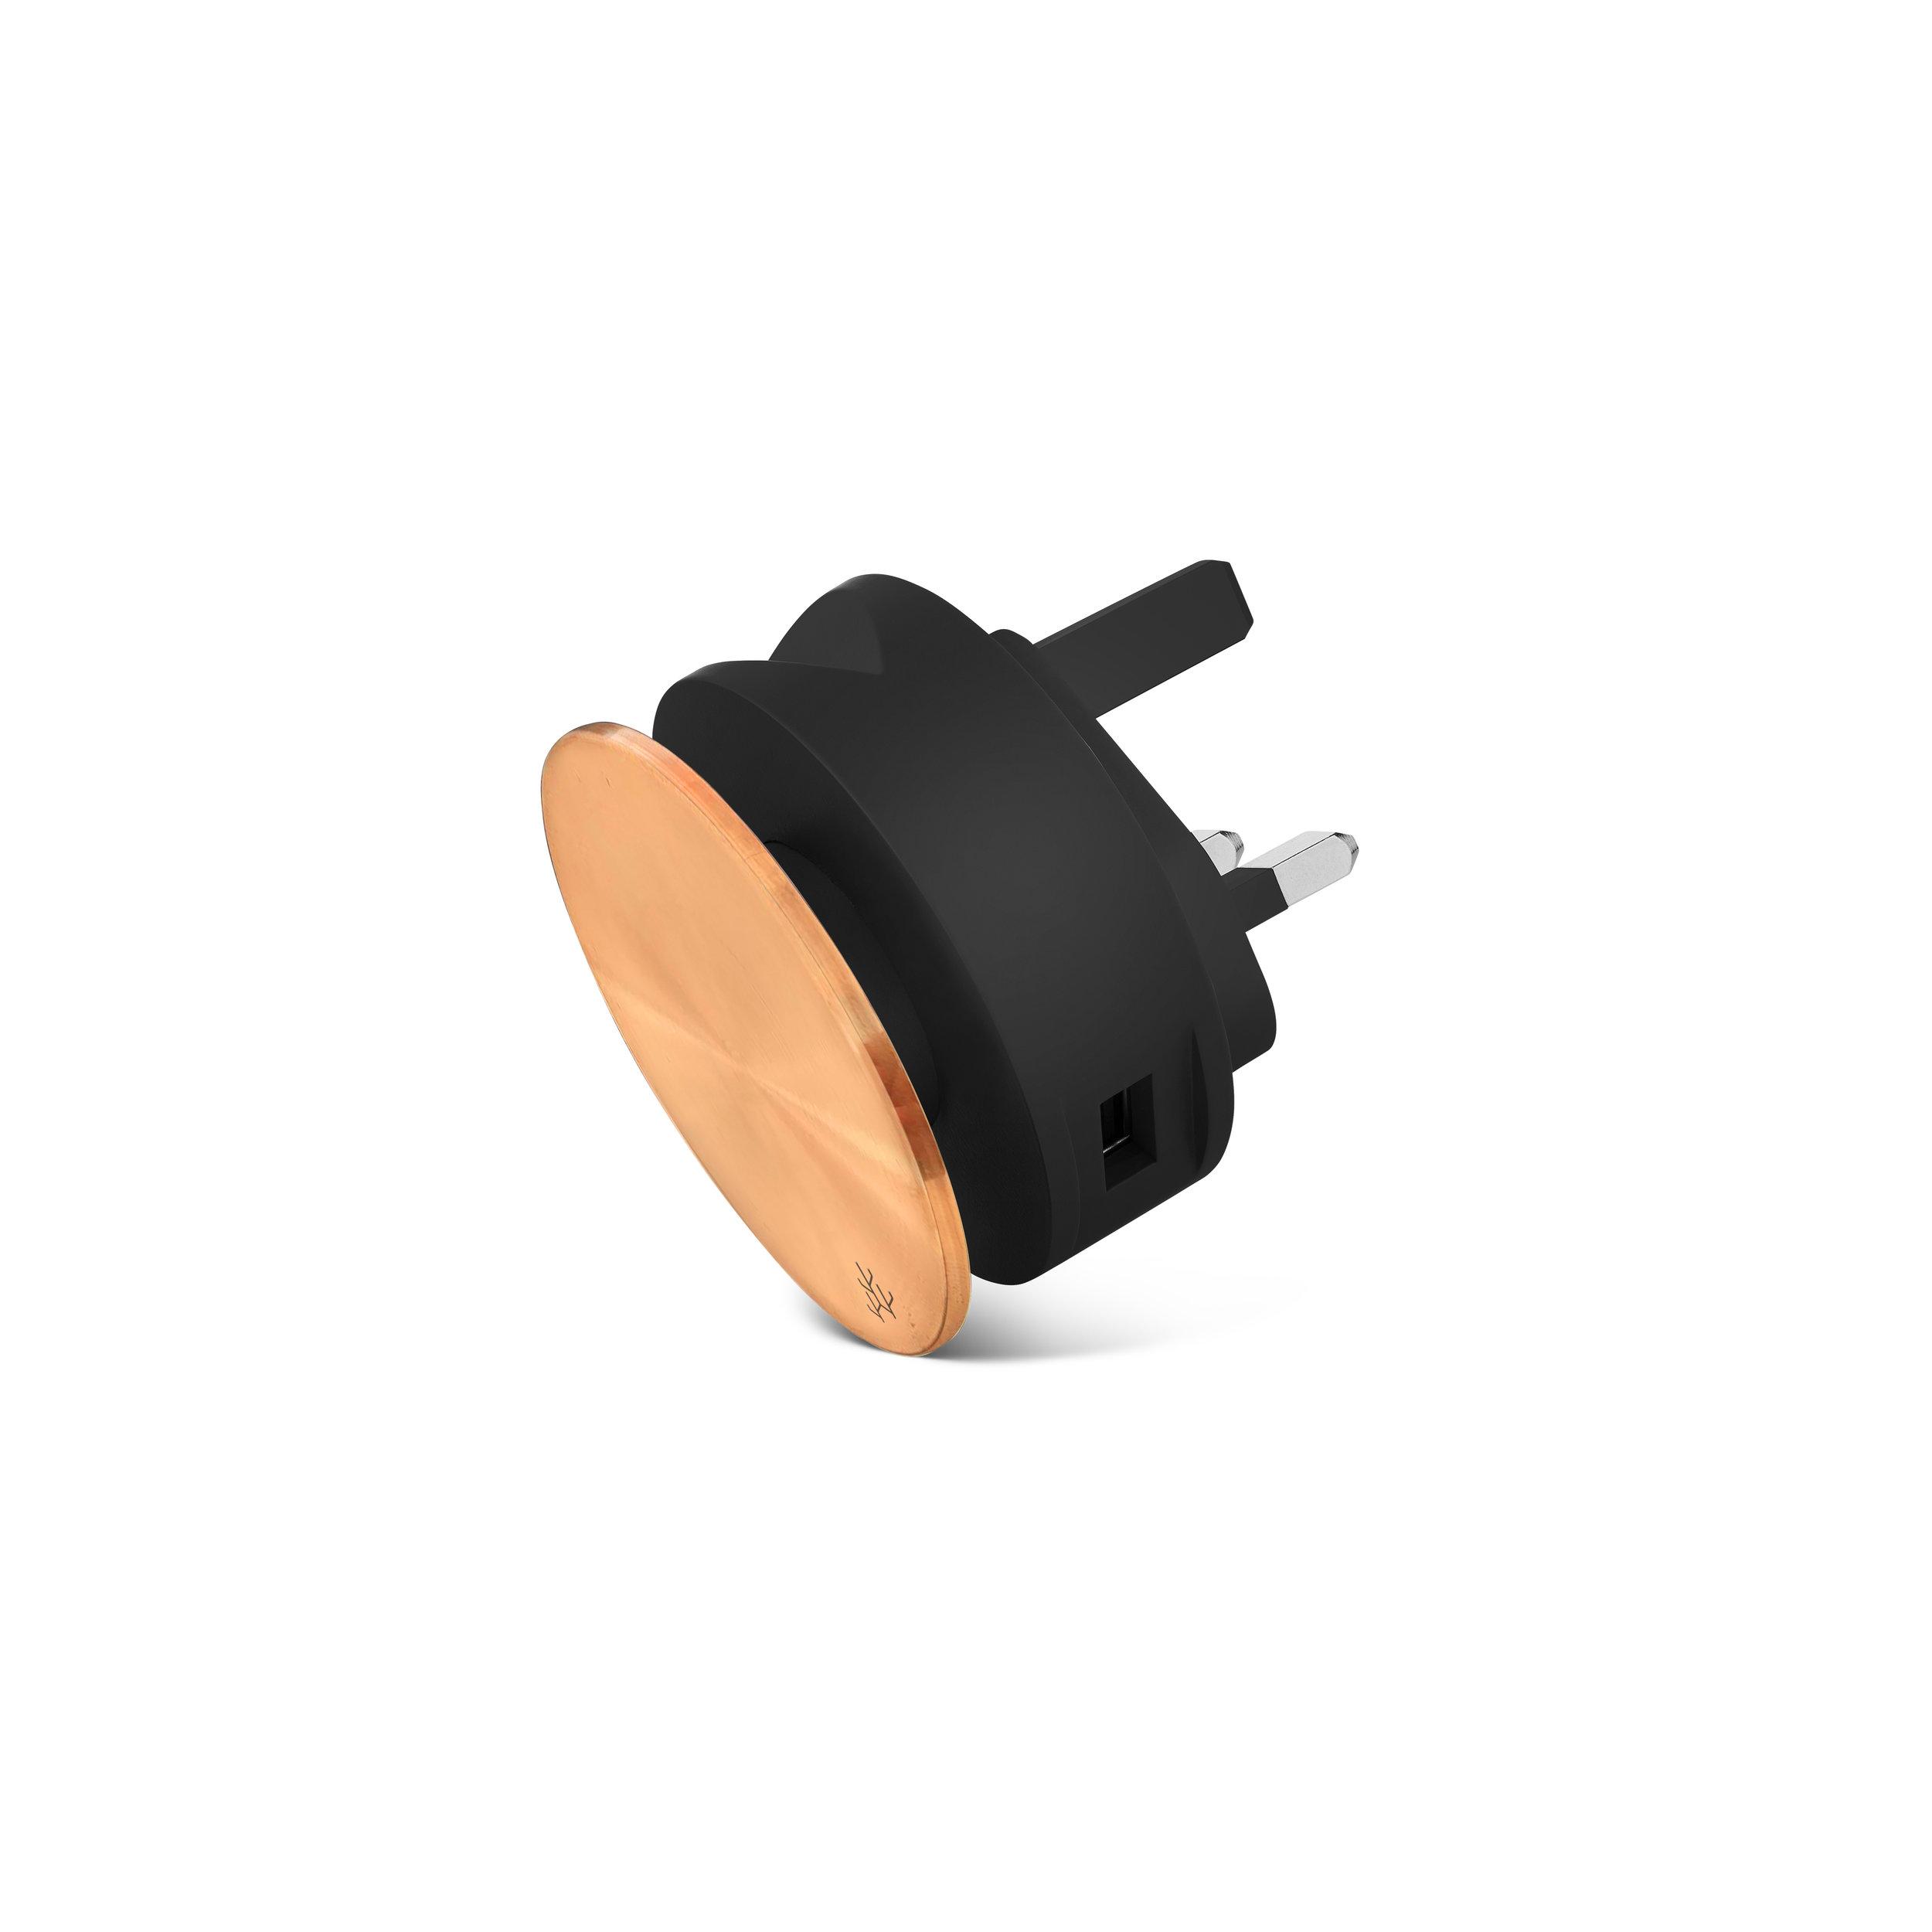 Usbepower_AERO_Mini_copper_side_UK.jpg